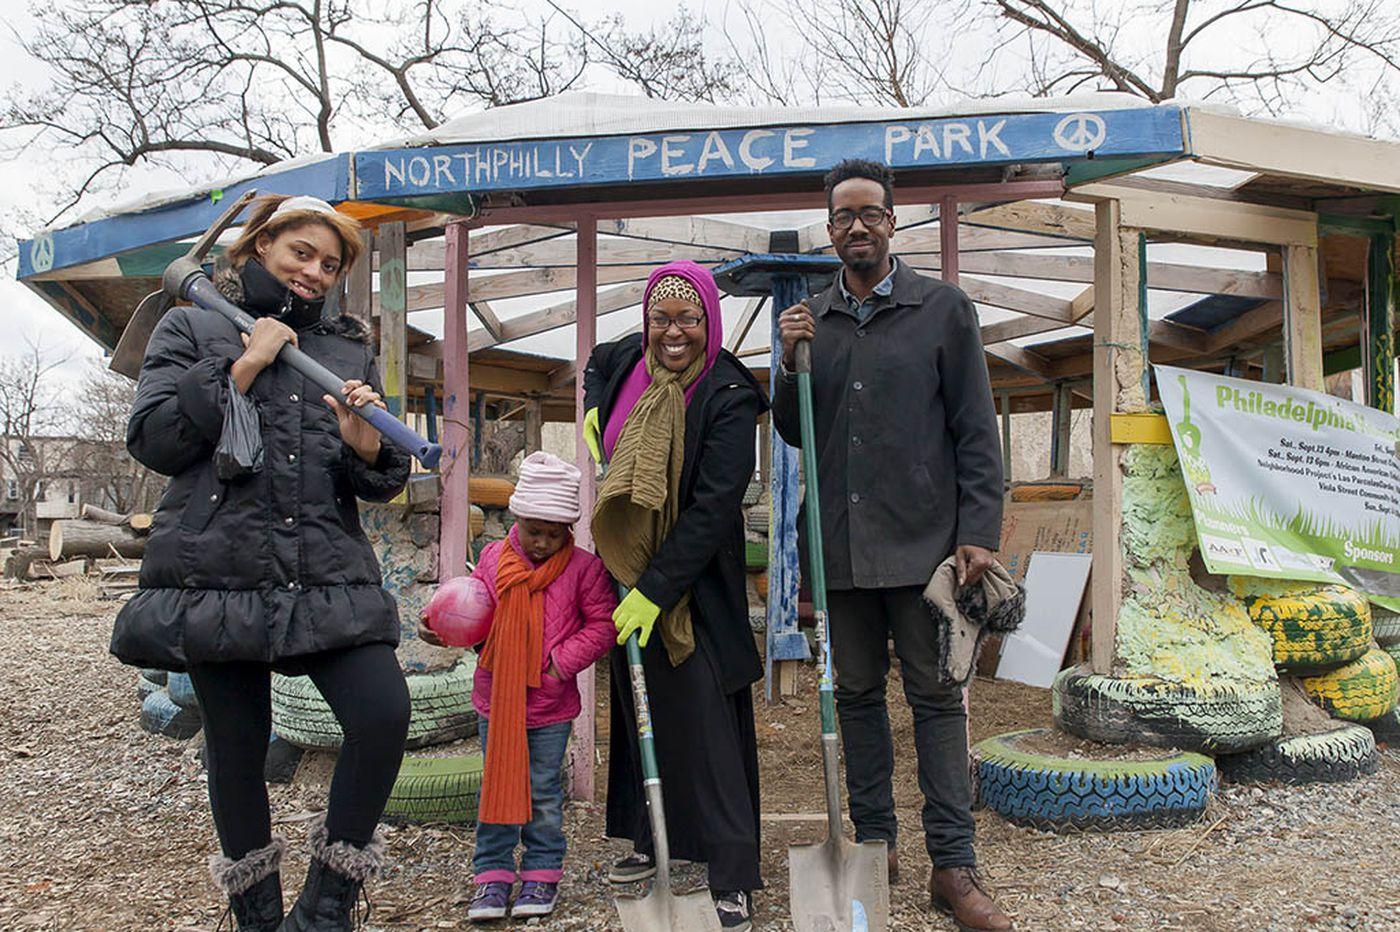 City's progress and a small park create a clash